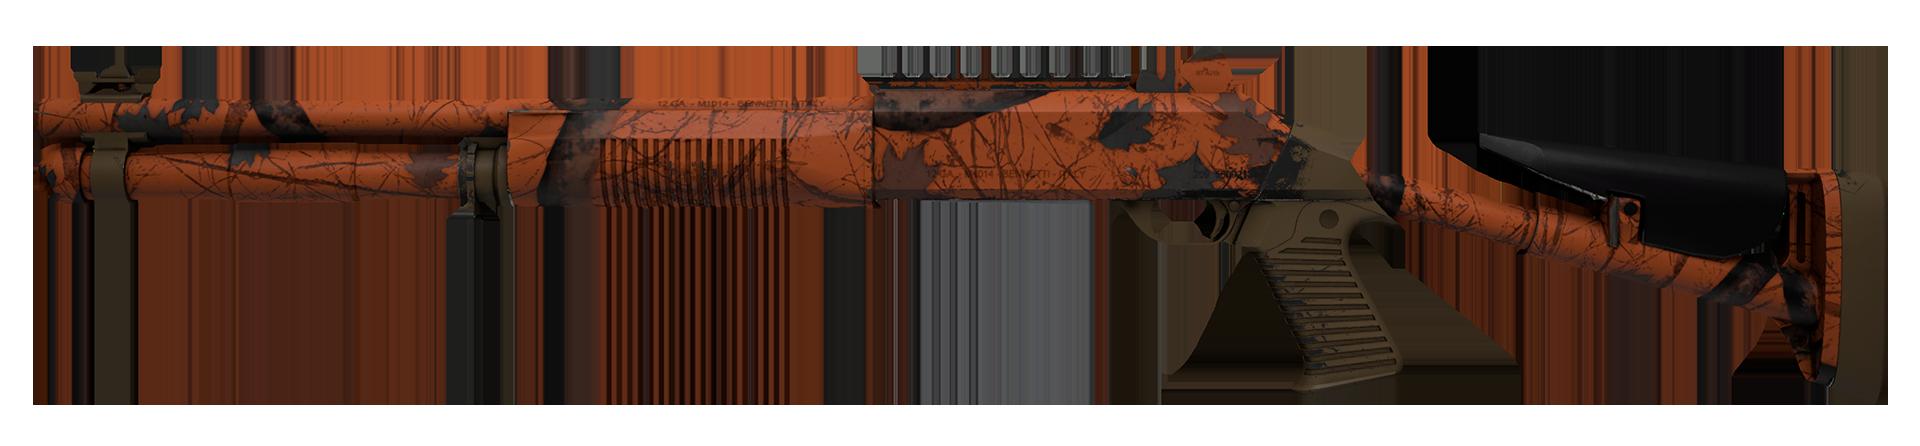 XM1014 Blaze Orange Large Rendering